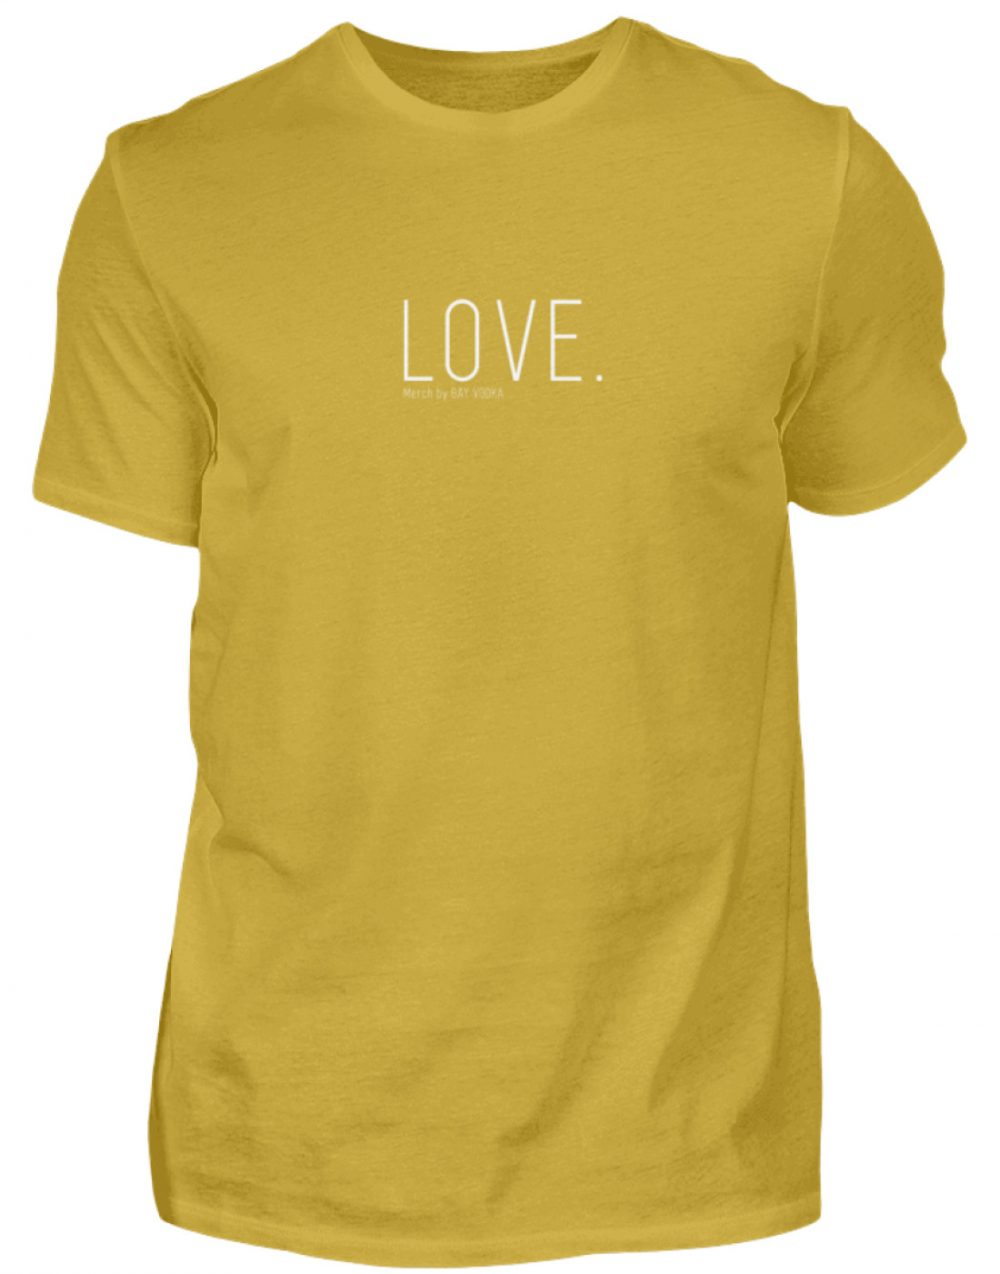 LOVE. - Herren Premiumshirt-2980